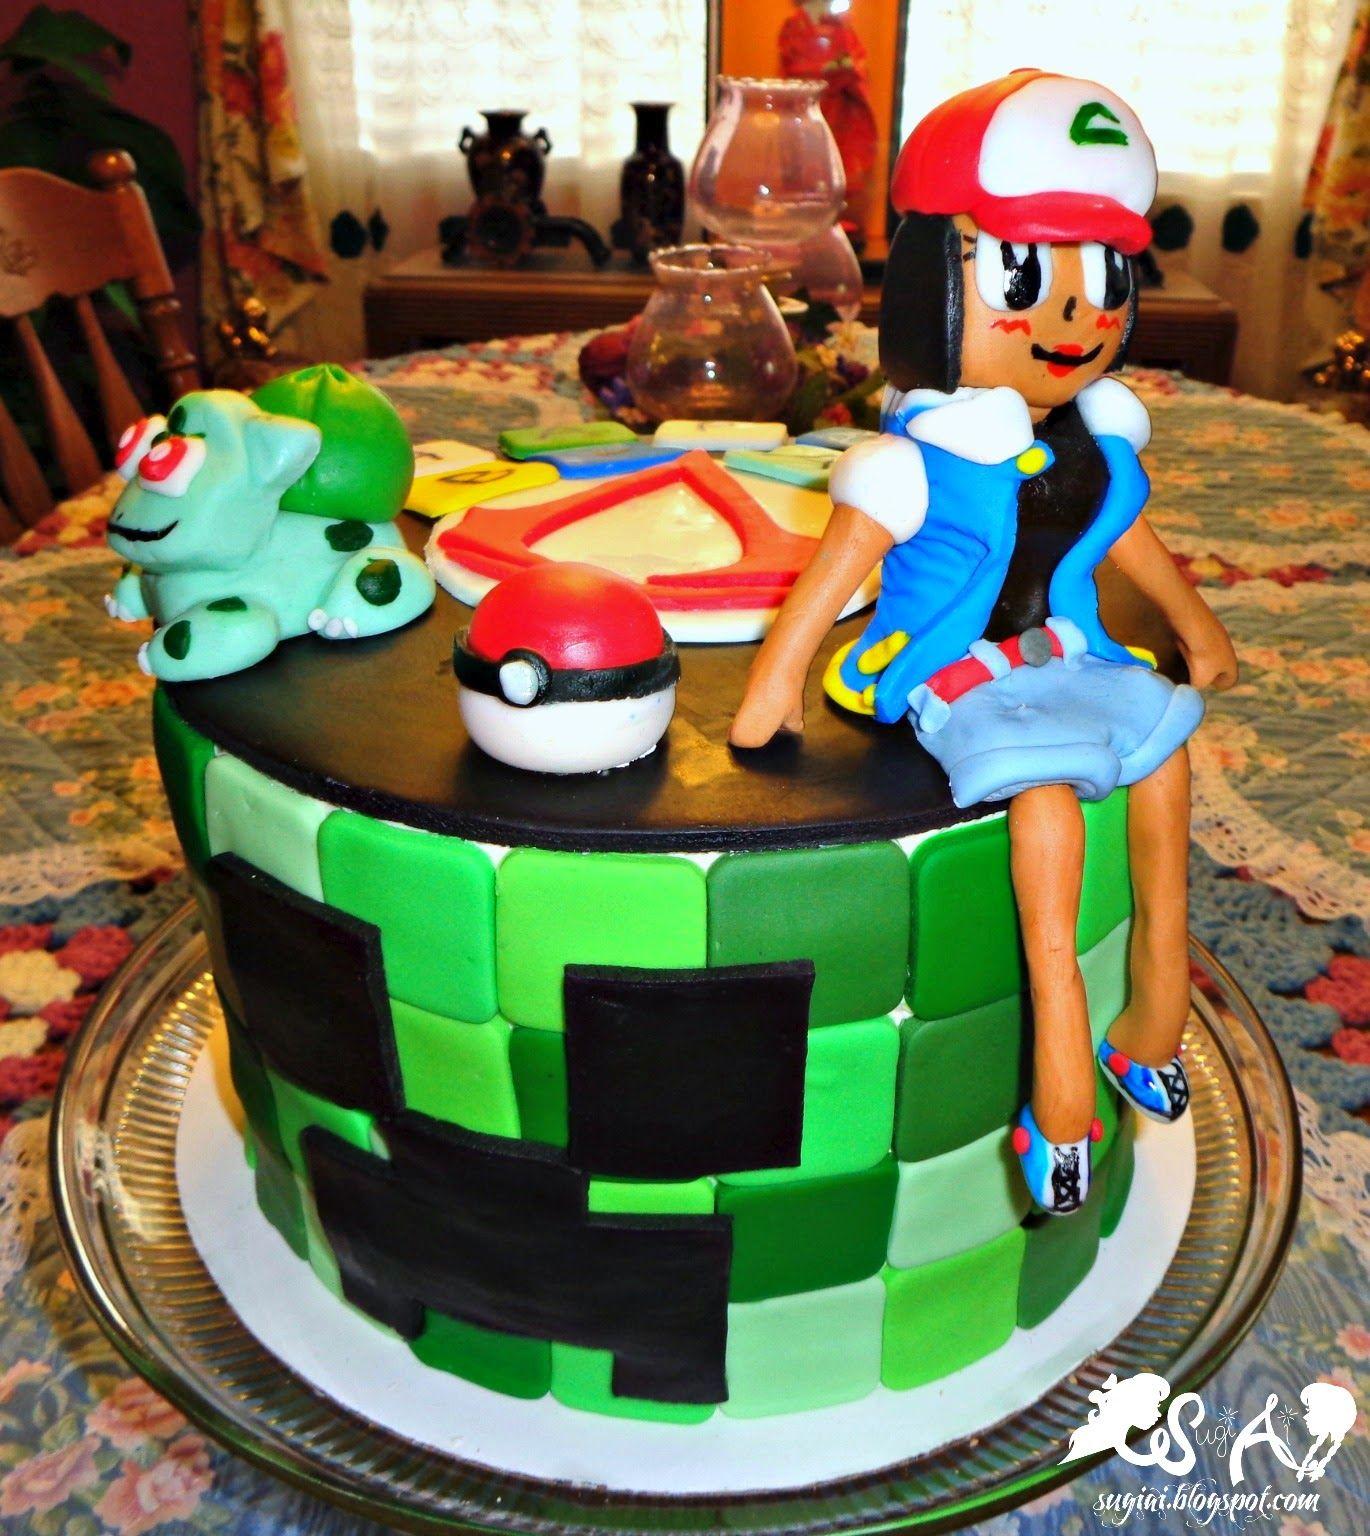 Video Game Birthday Cake. Minecraft Creeper, Pokemon, and